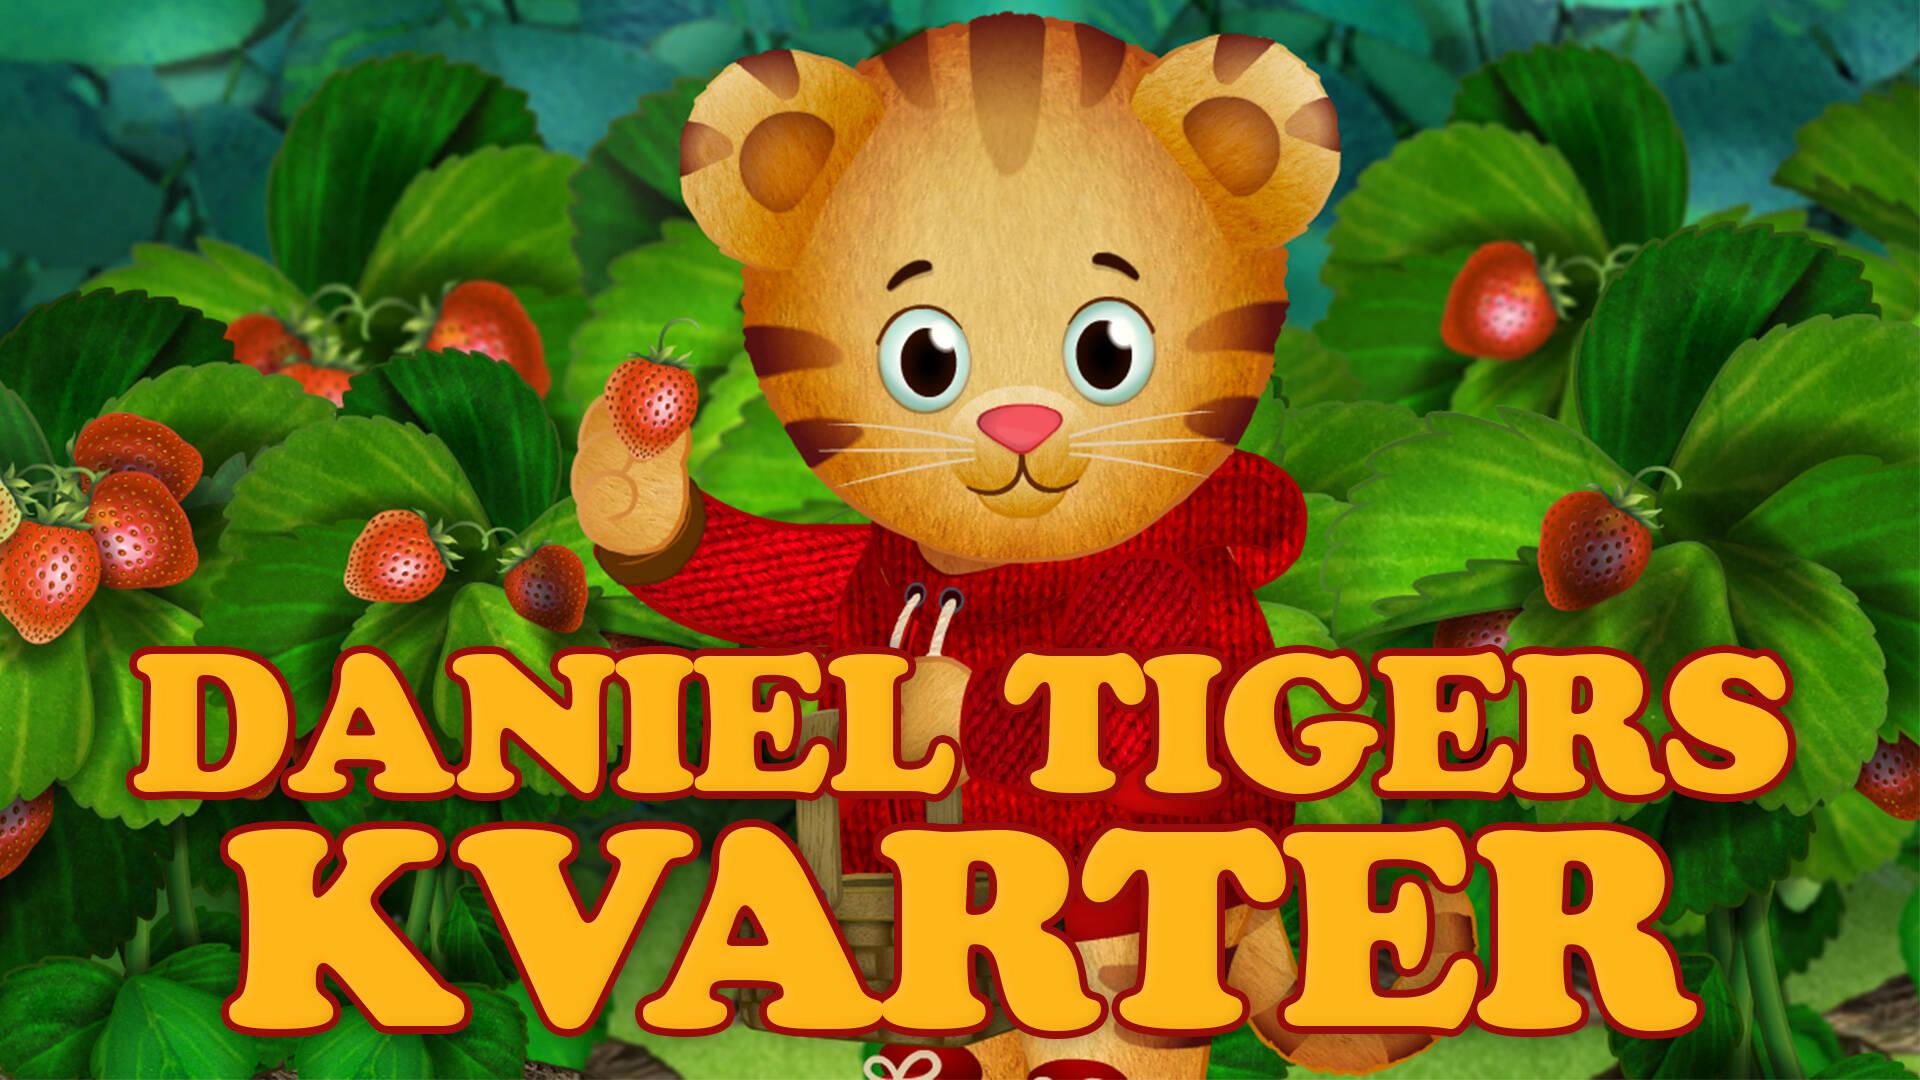 Daniel tiger - barnfilmer